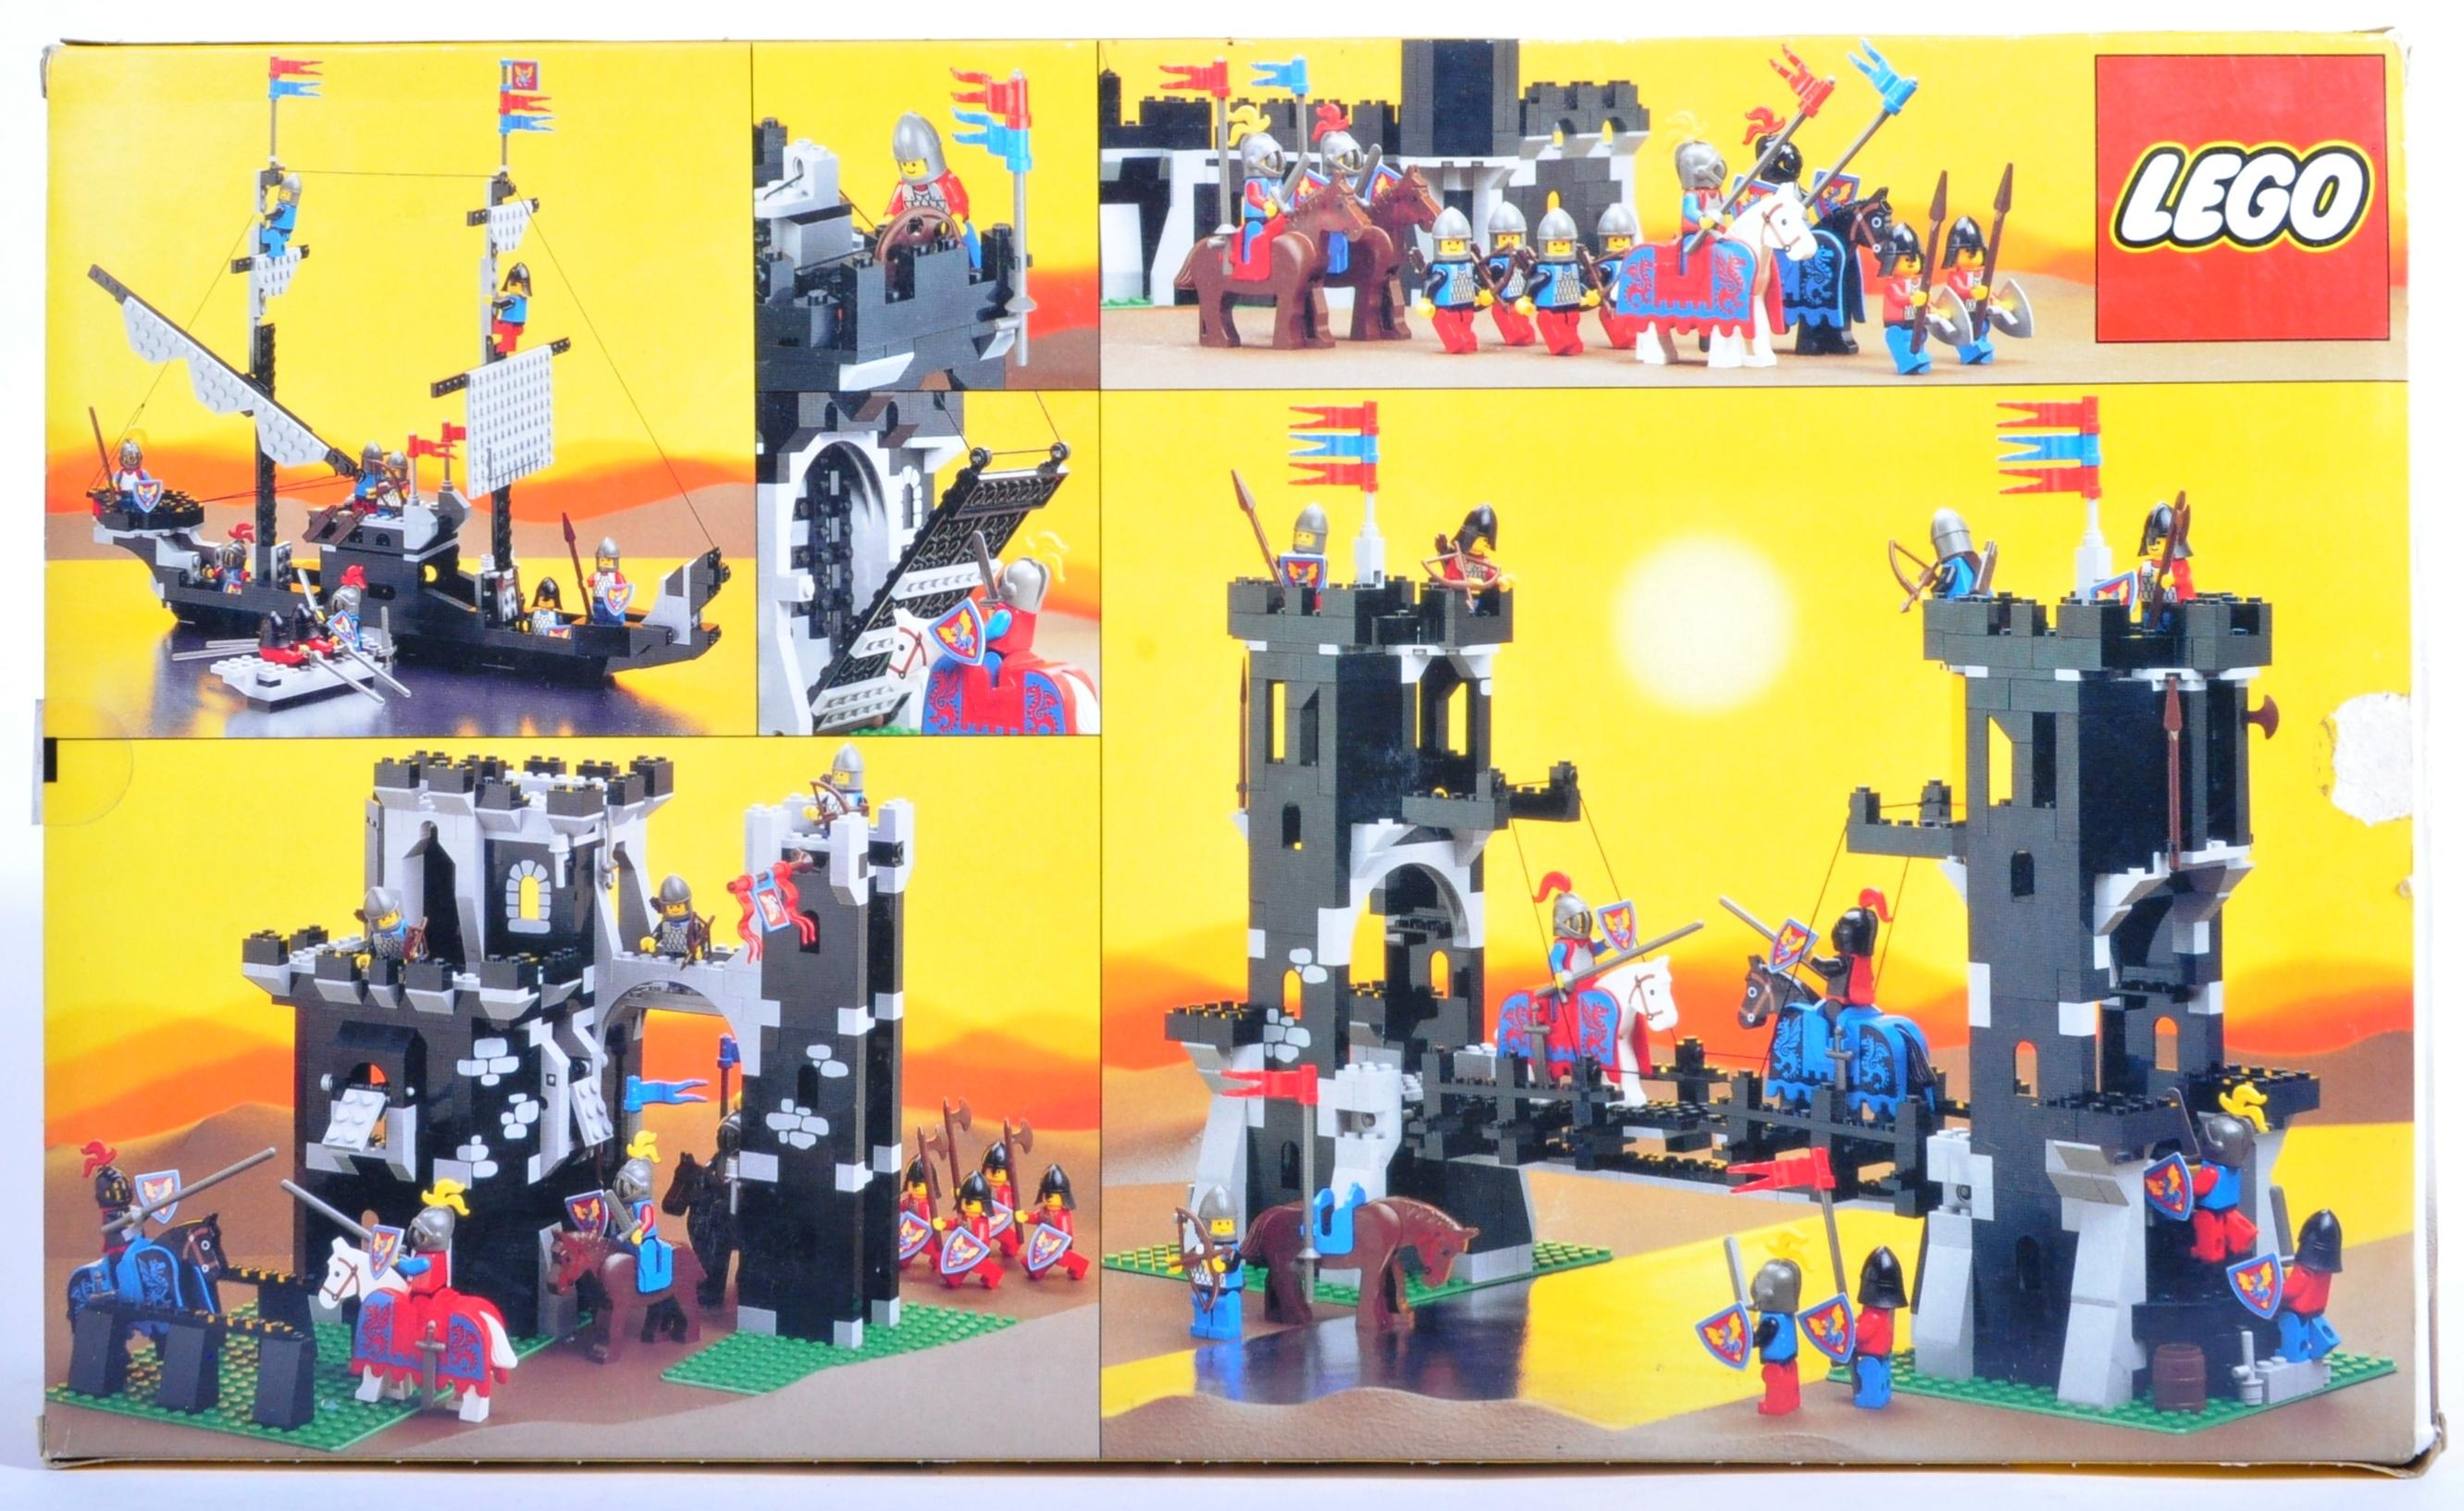 LEGO SET - LEGO LAND - 6085 - BLACK MONARCH'S CASTLE - Image 2 of 4